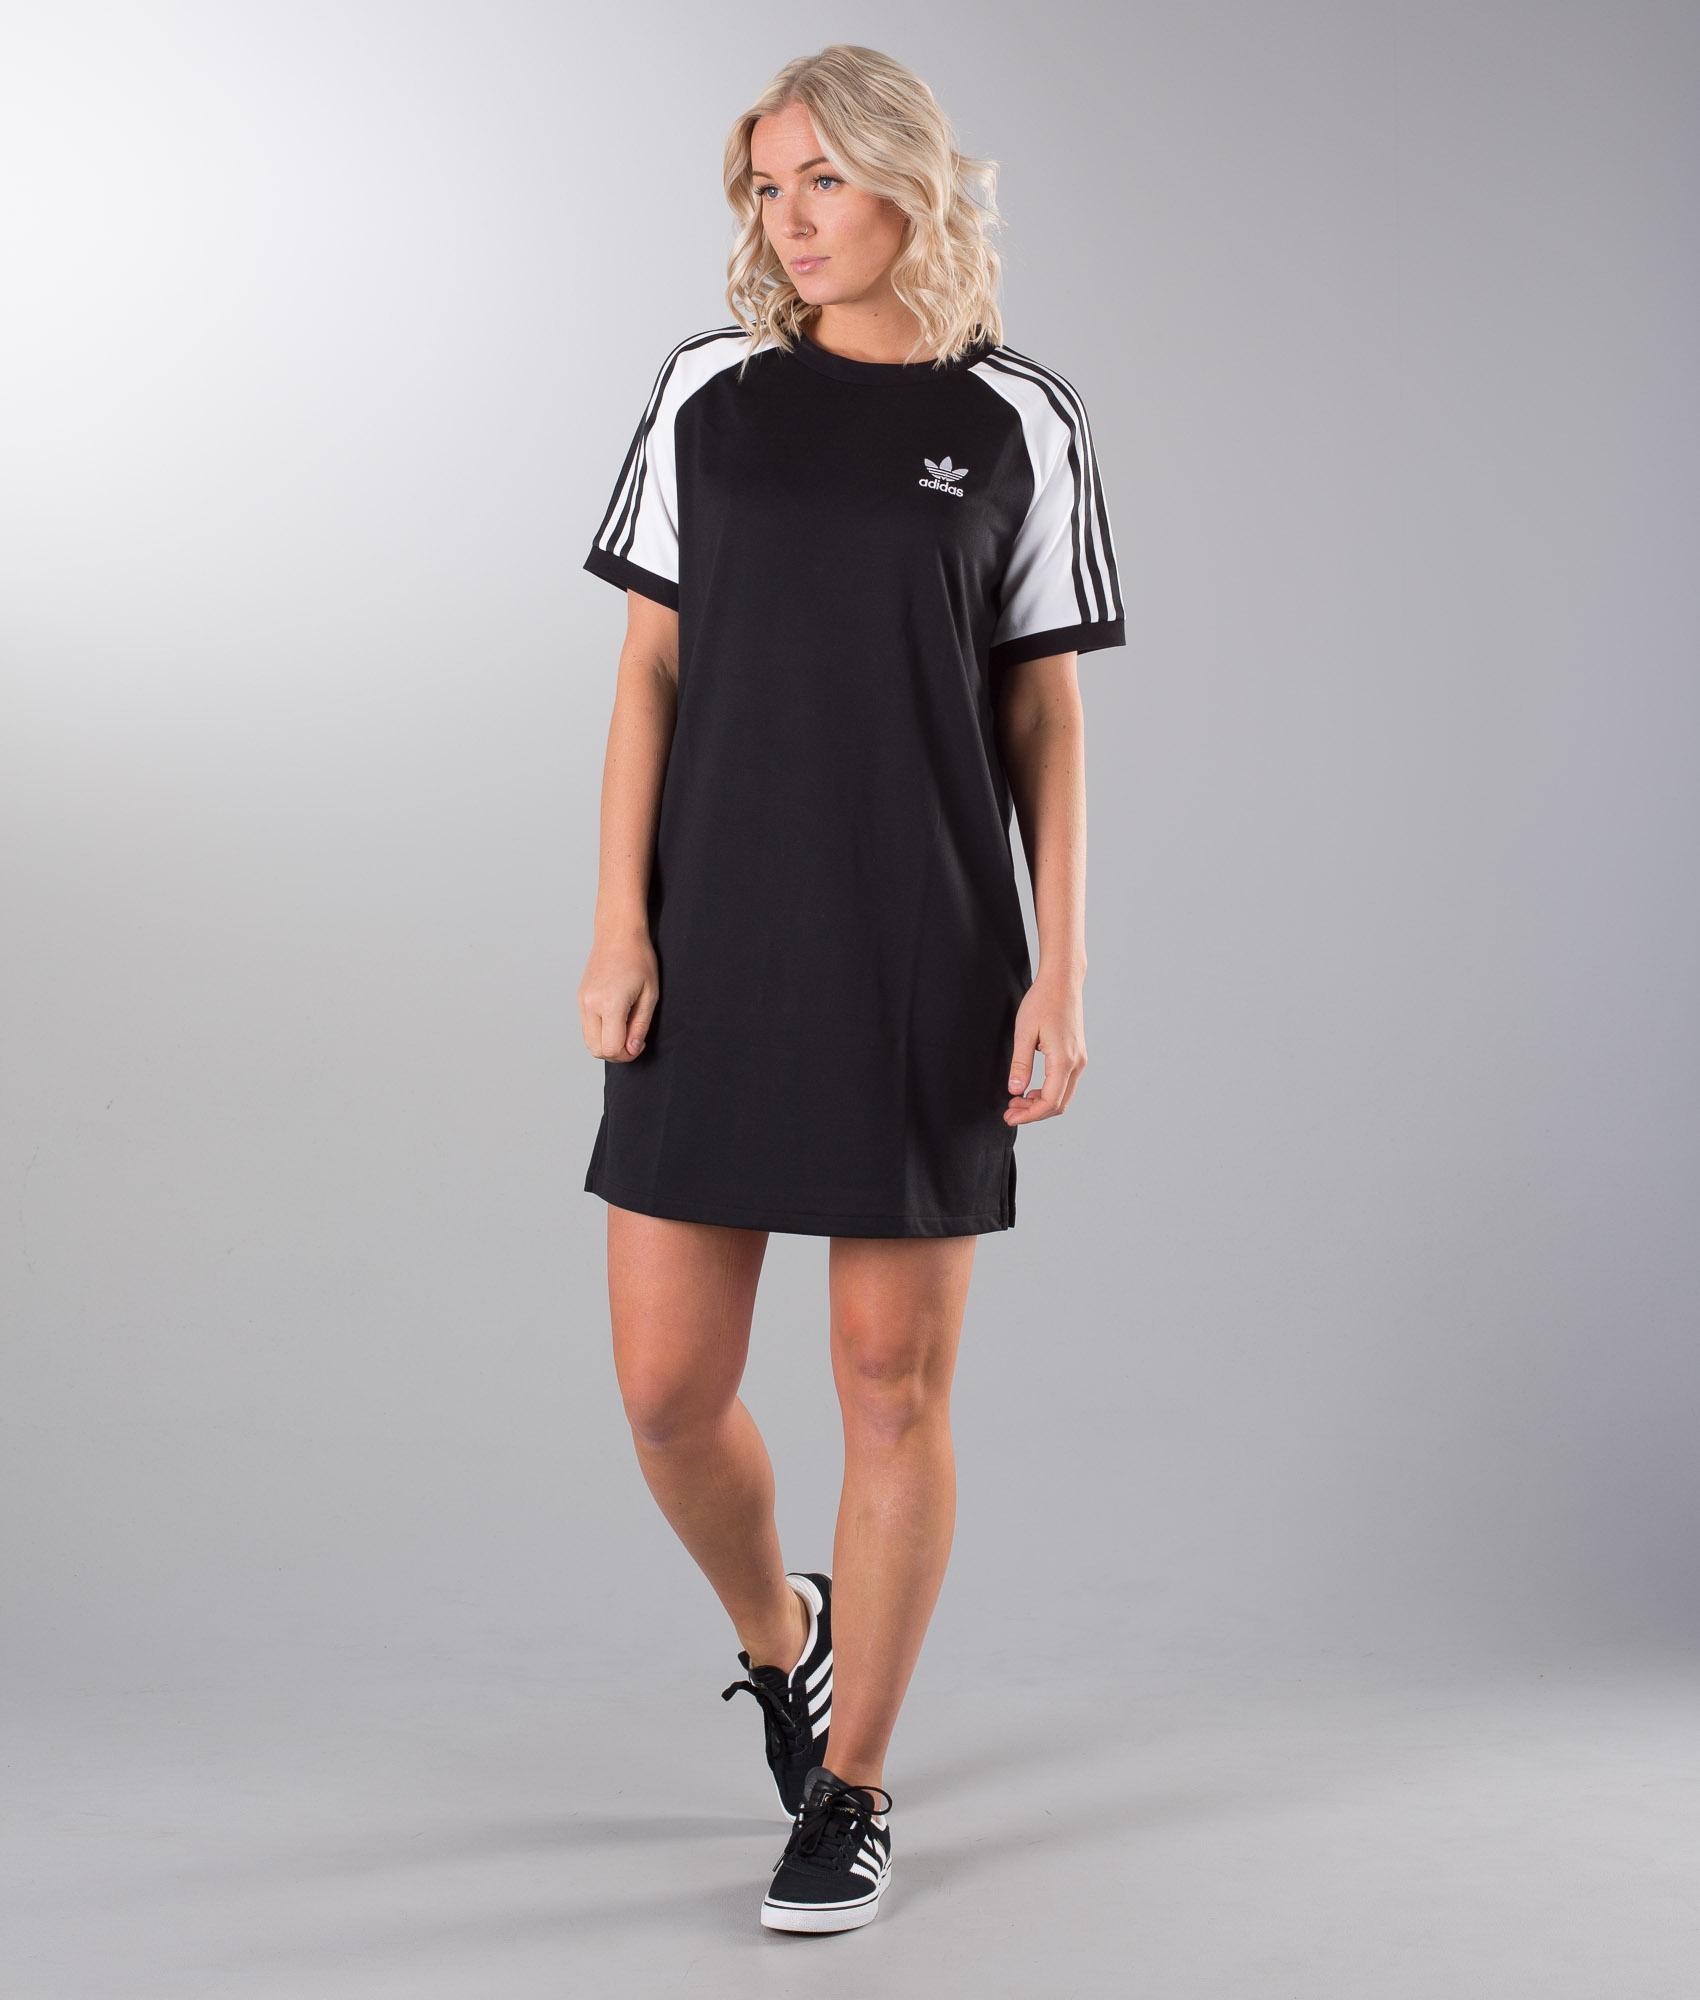 Raglan Jurk Originals nl Black Ridestore Adidas k0OPnw